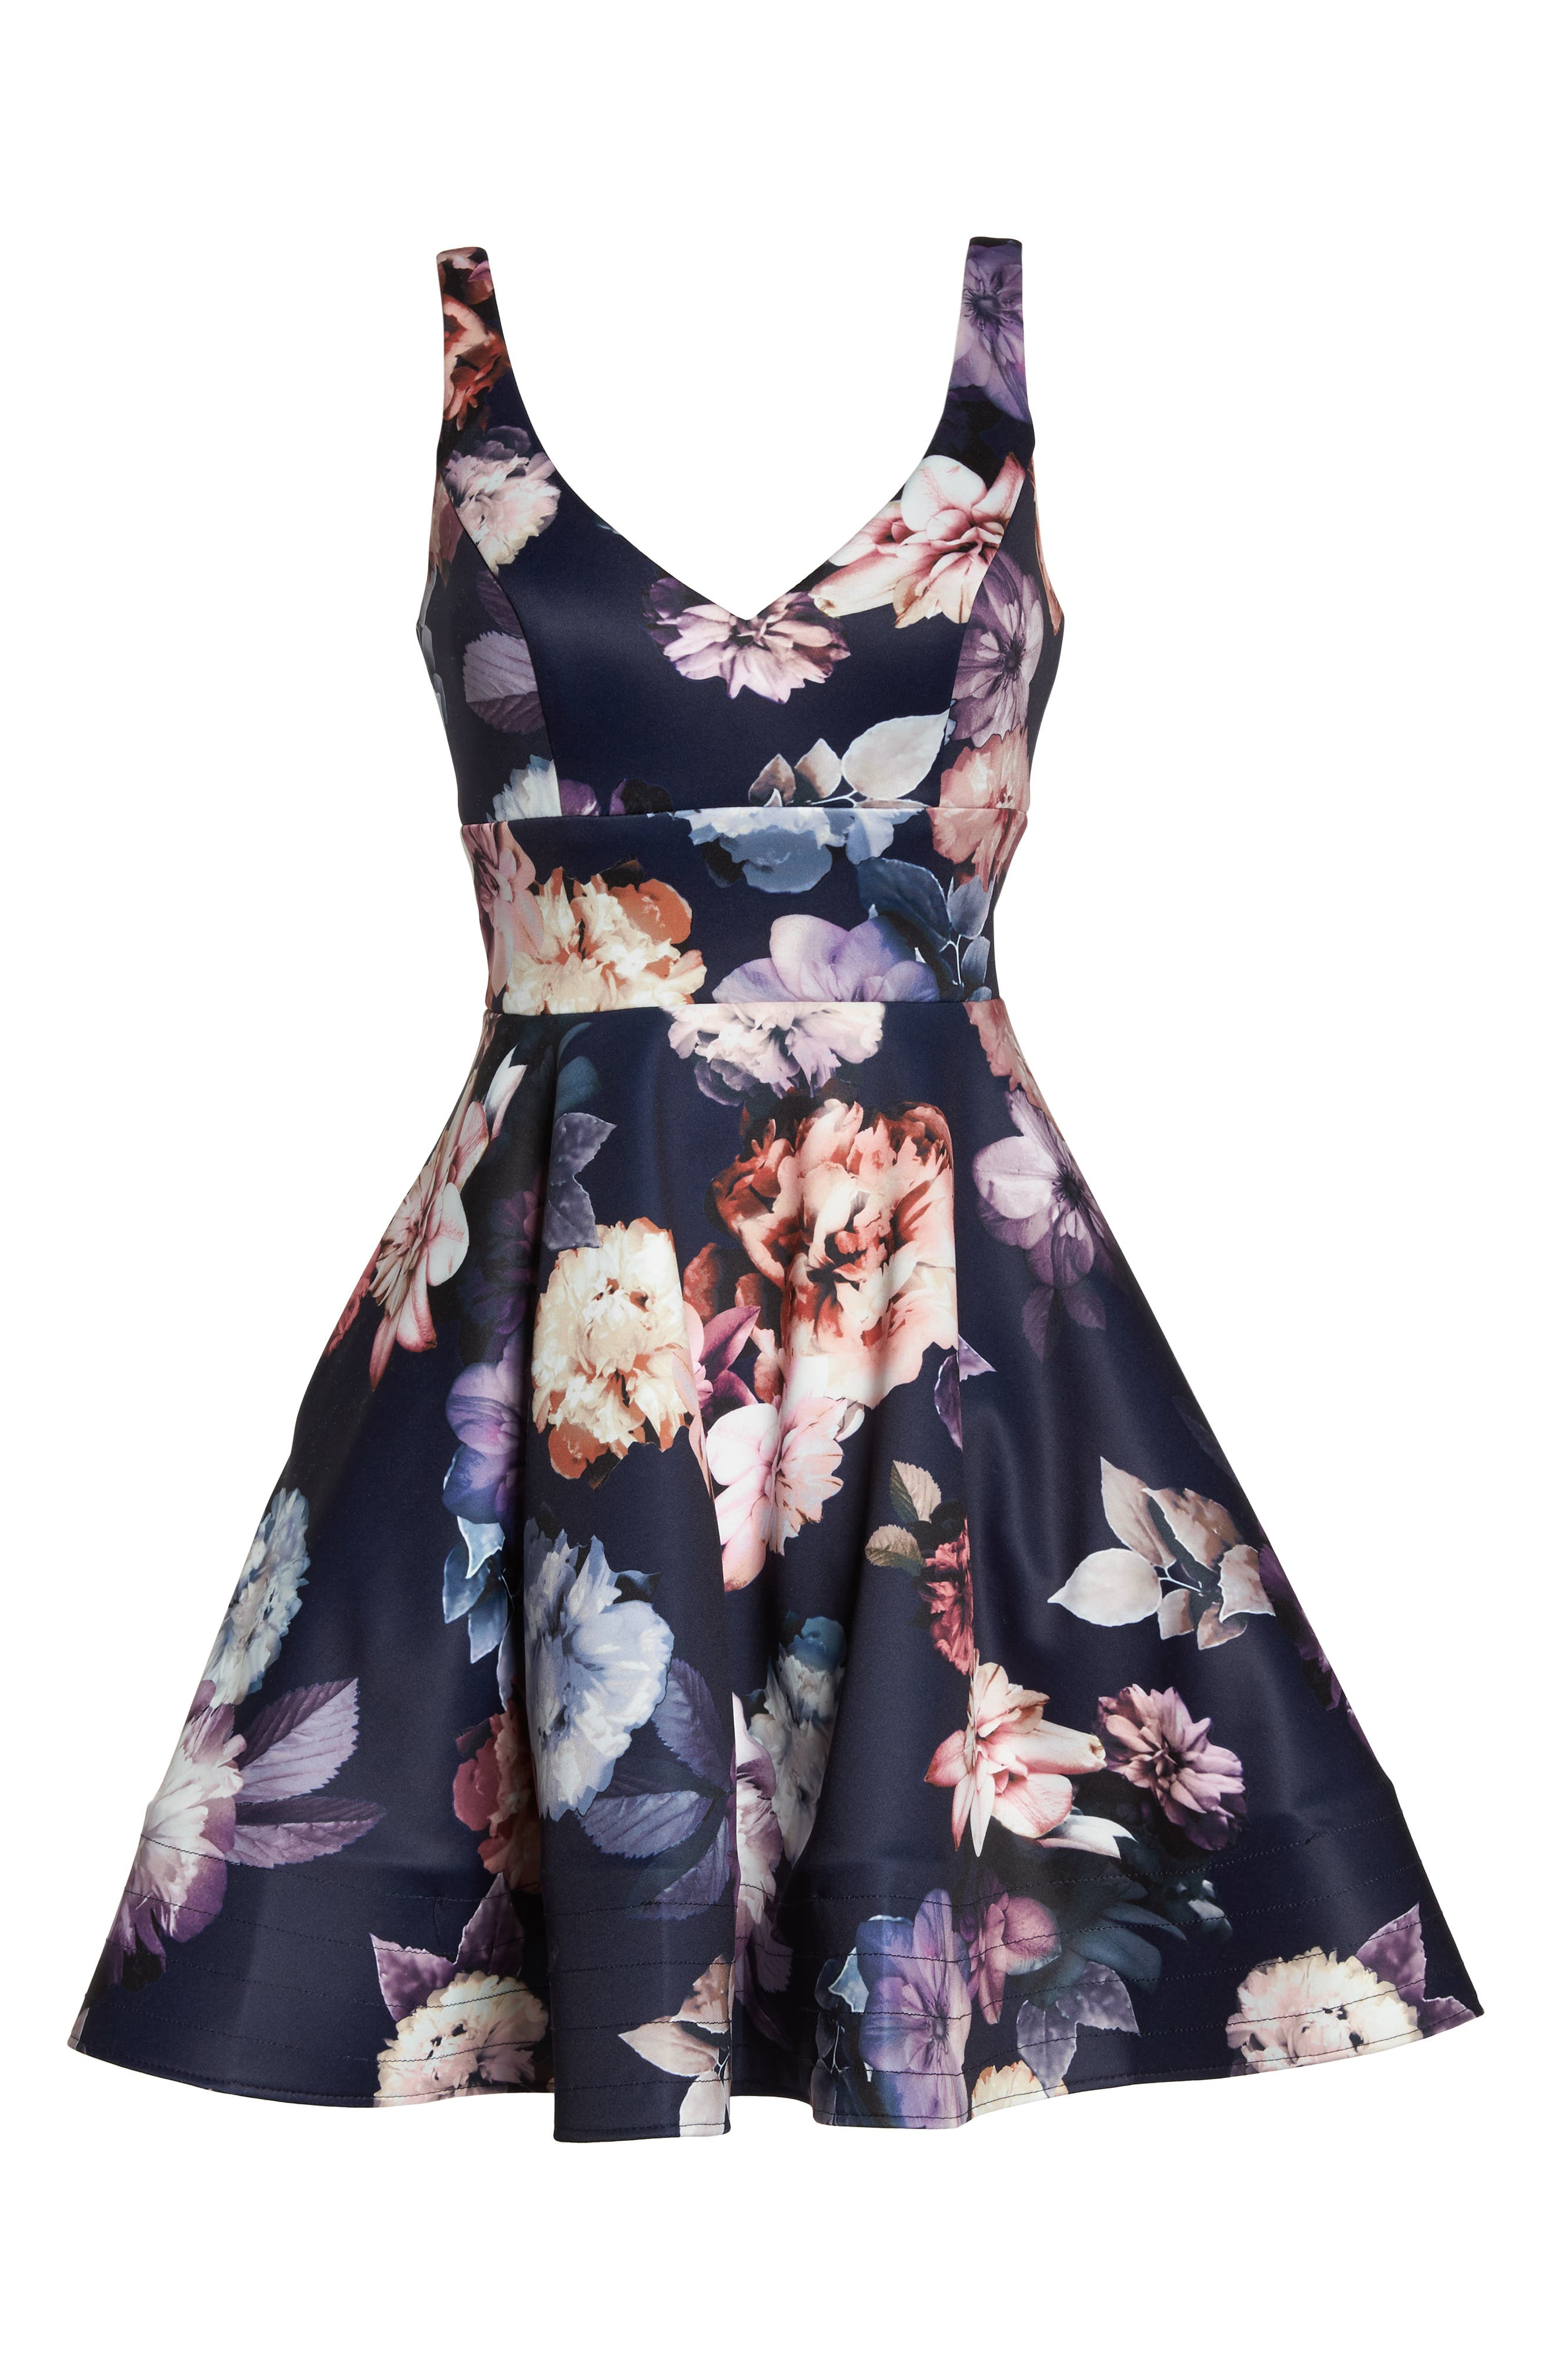 Floral Print Fit & Flare Dress,                             Alternate thumbnail 7, color,                             NAVY/ PURPLE